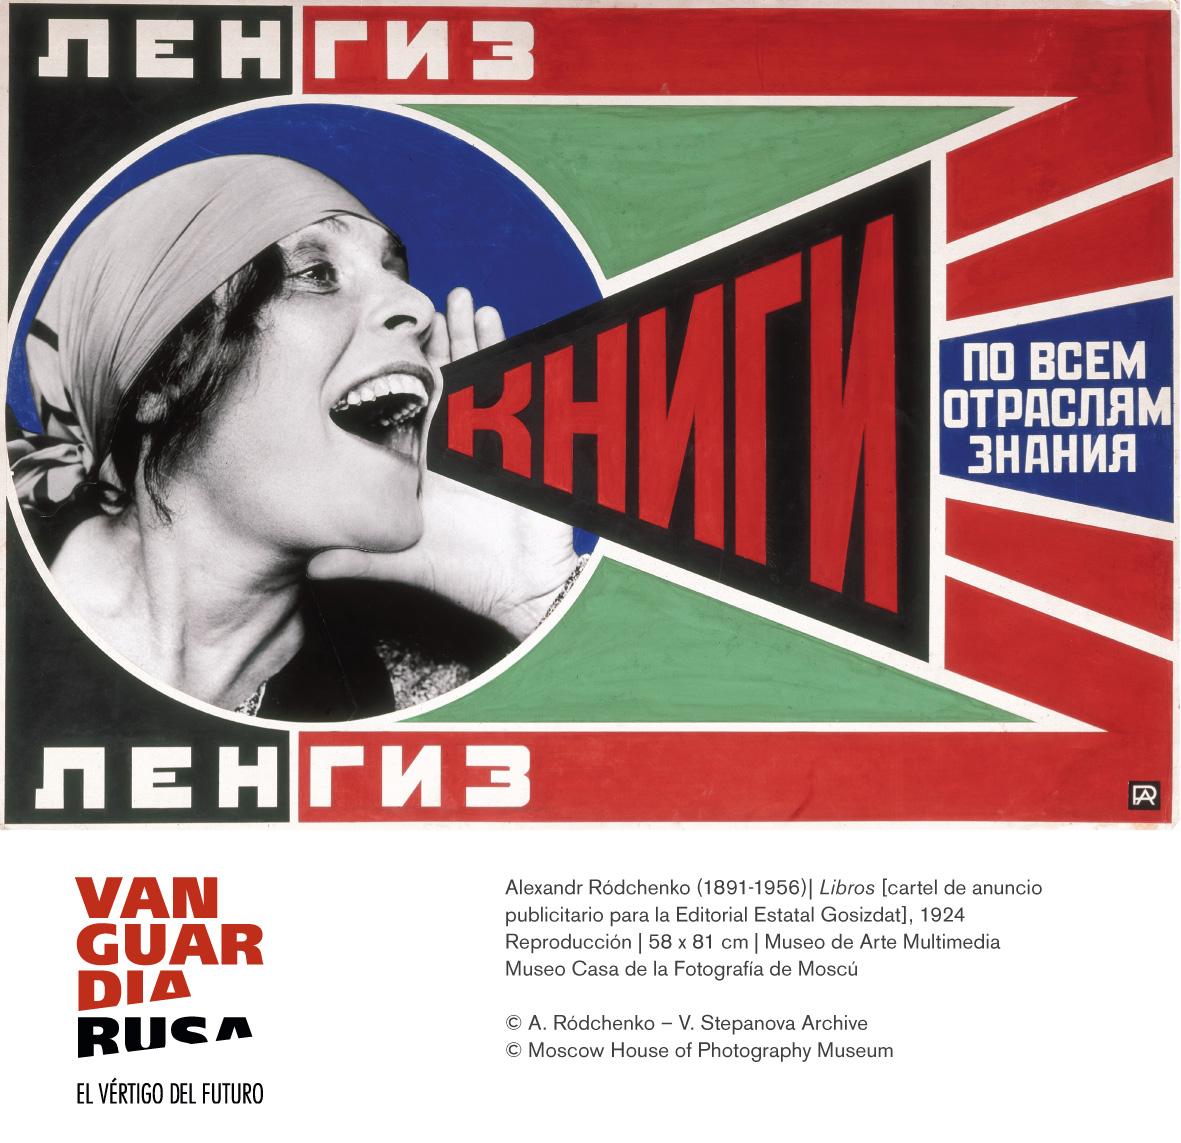 vanguardia rusa 5